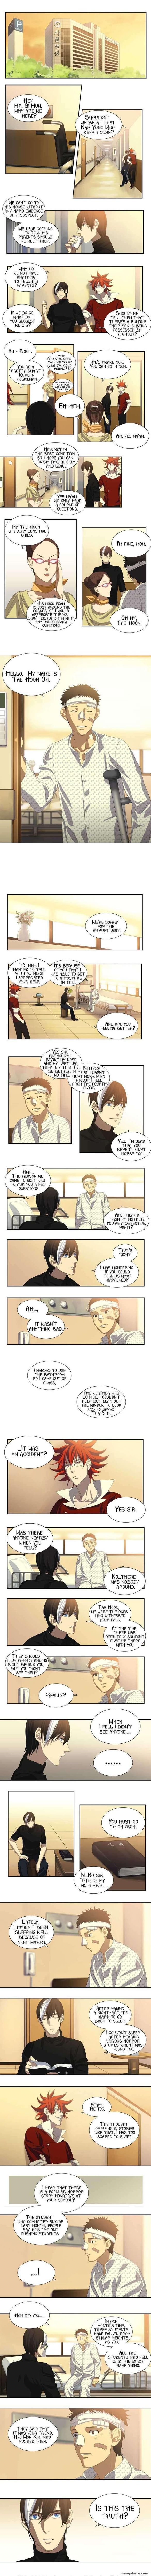 Supernatural Investigation Department 12 Page 2